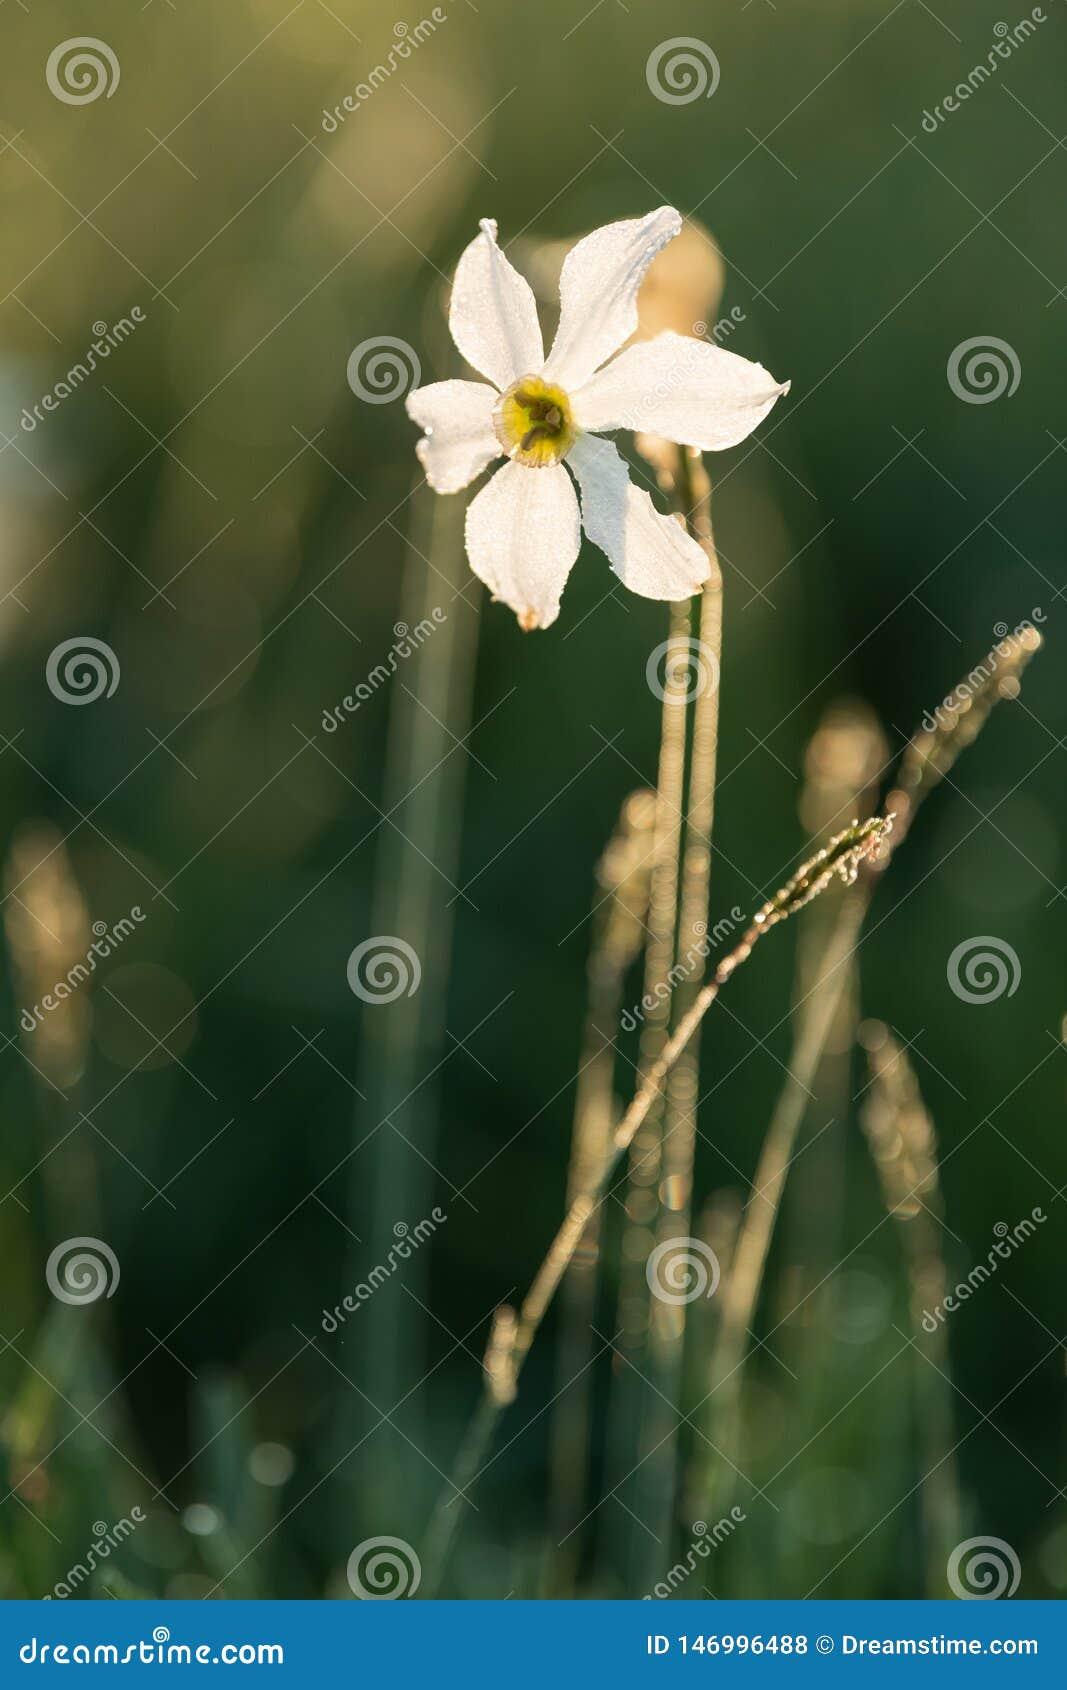 Petite jonquille sauvage blanche, radiflorus de narcisse